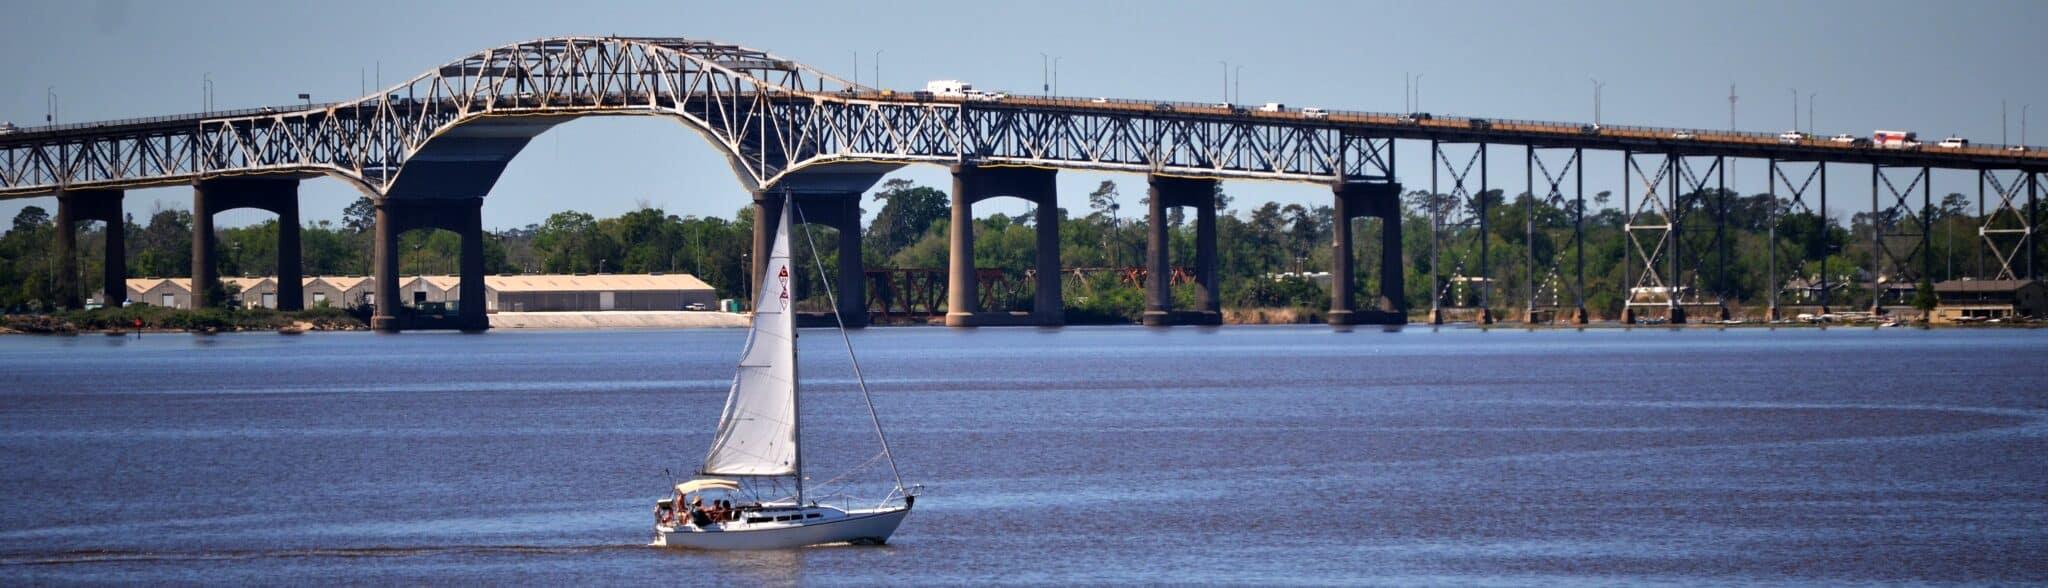 The Lake Charles Louisiana